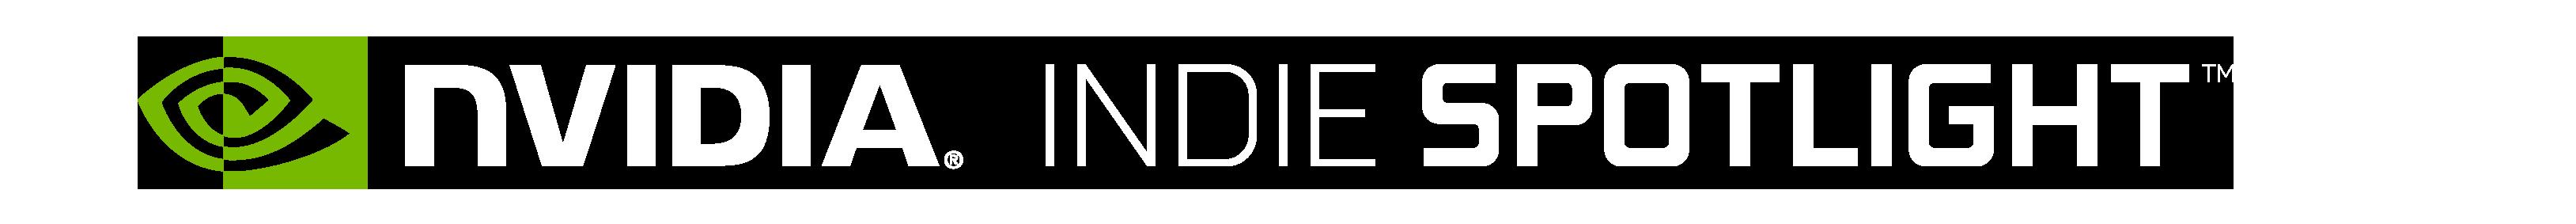 nv-indie-spotlight